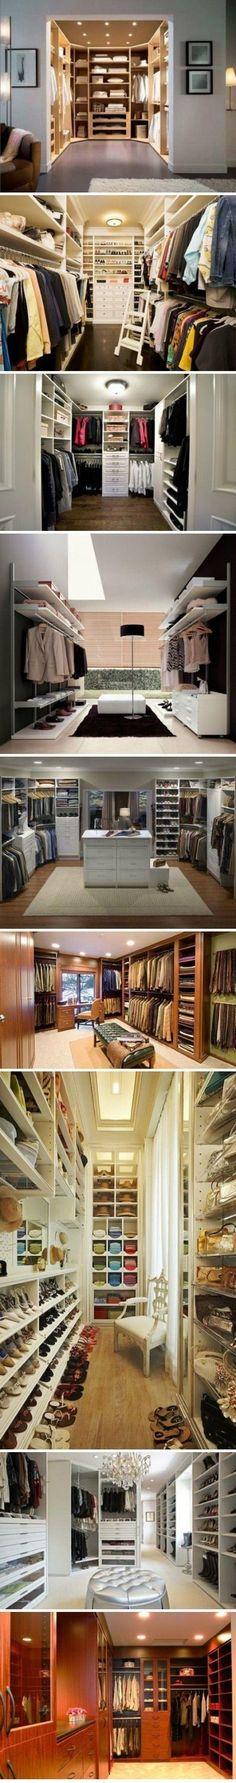 Walk-in closet design Walk In Wardrobe, Walk In Closet, Master Closet, Closet Space, Master Suite, Closet Mirror, Huge Closet, Ideas De Closets, Closet Ideas